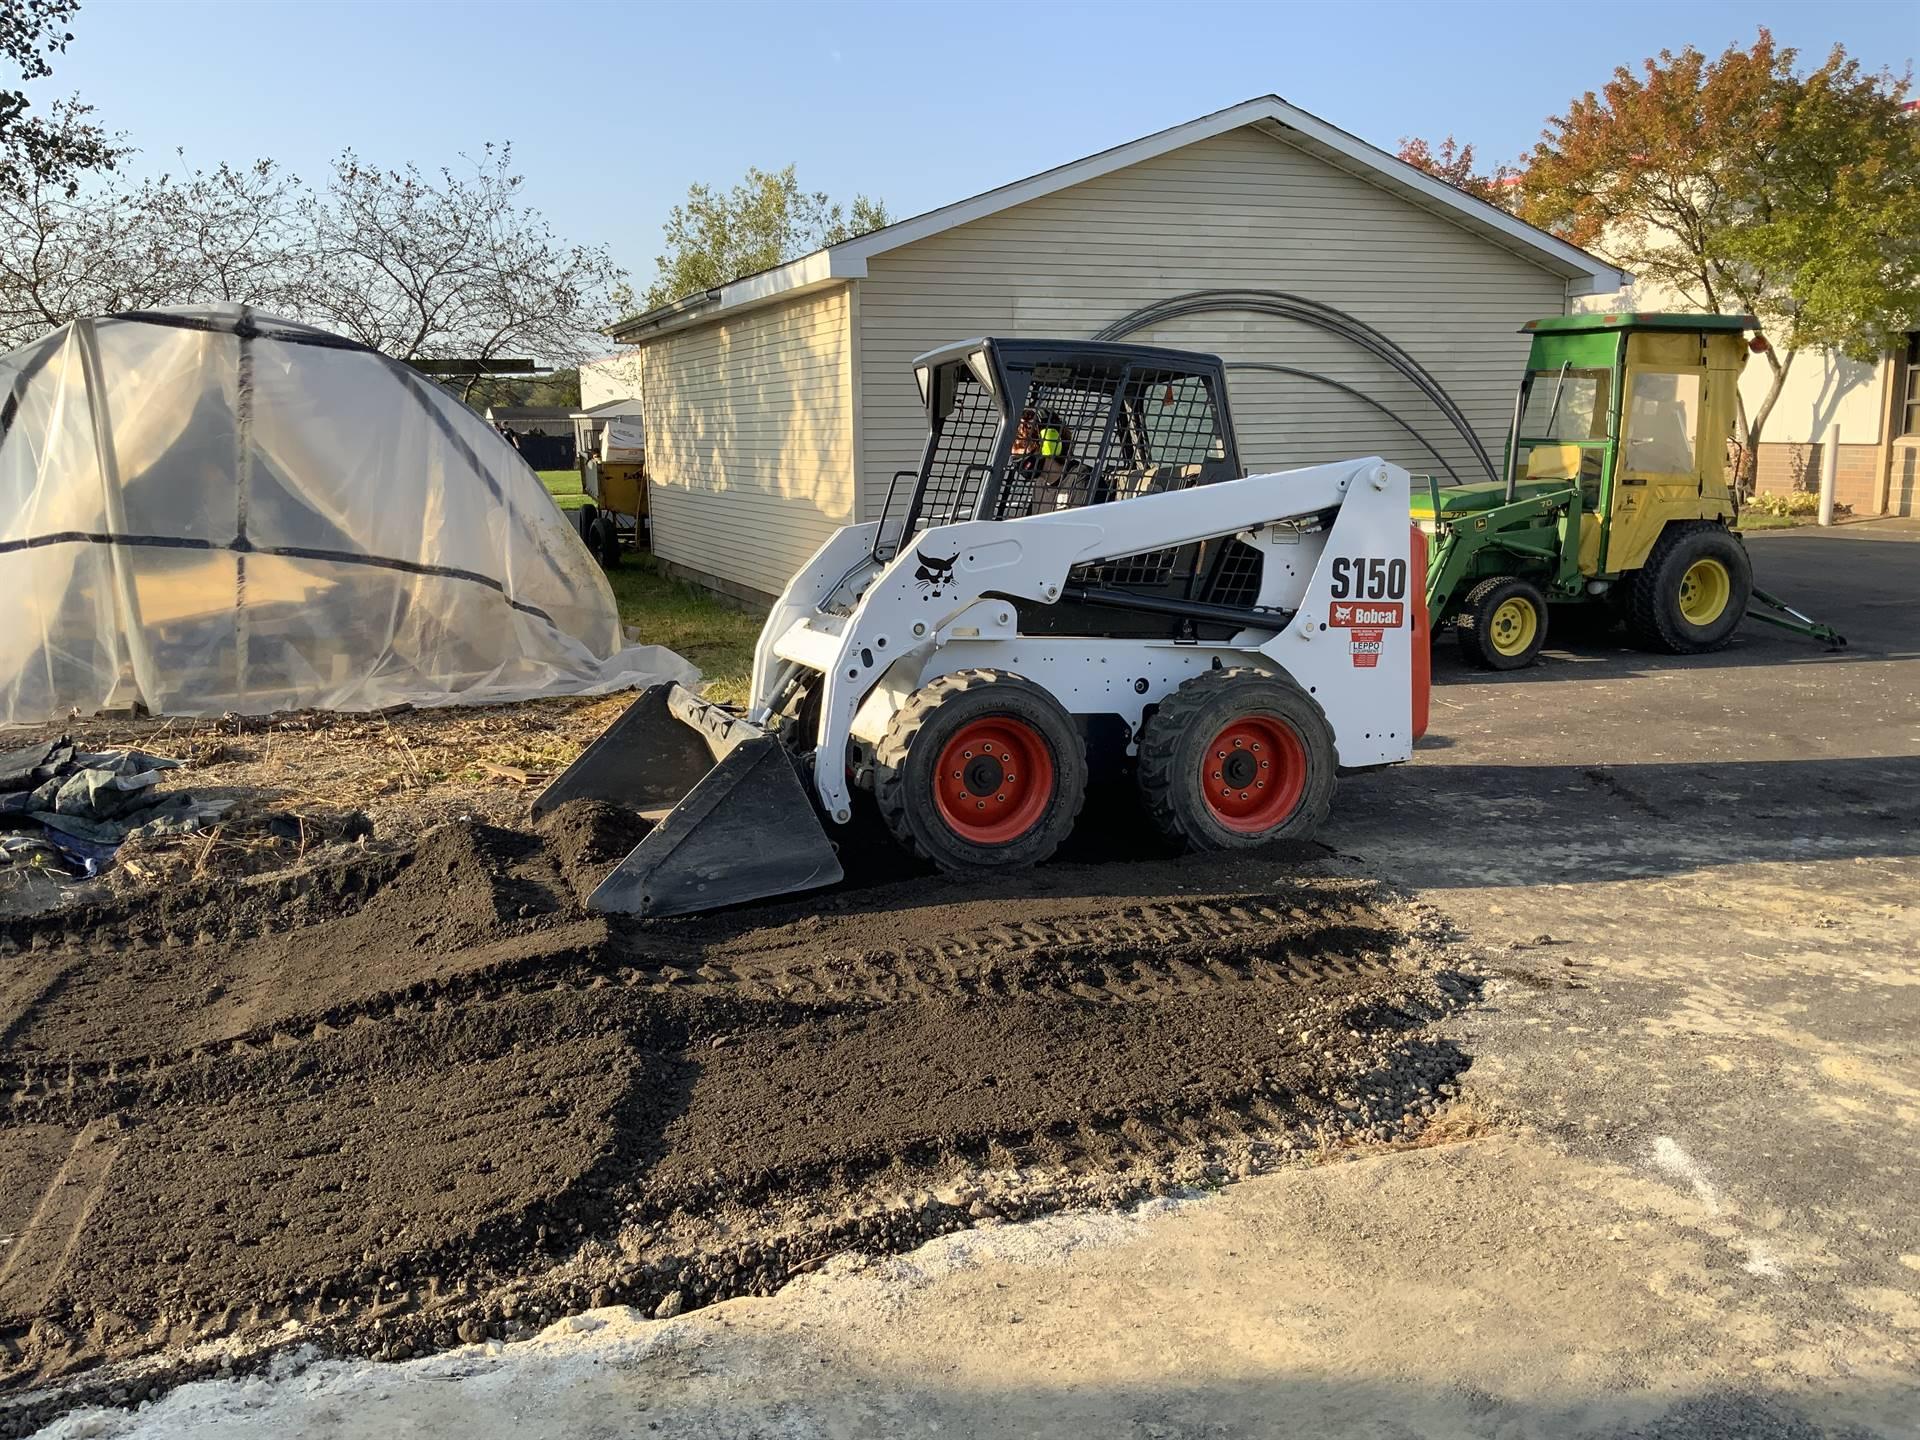 Heavy machinery scooper moving dirt